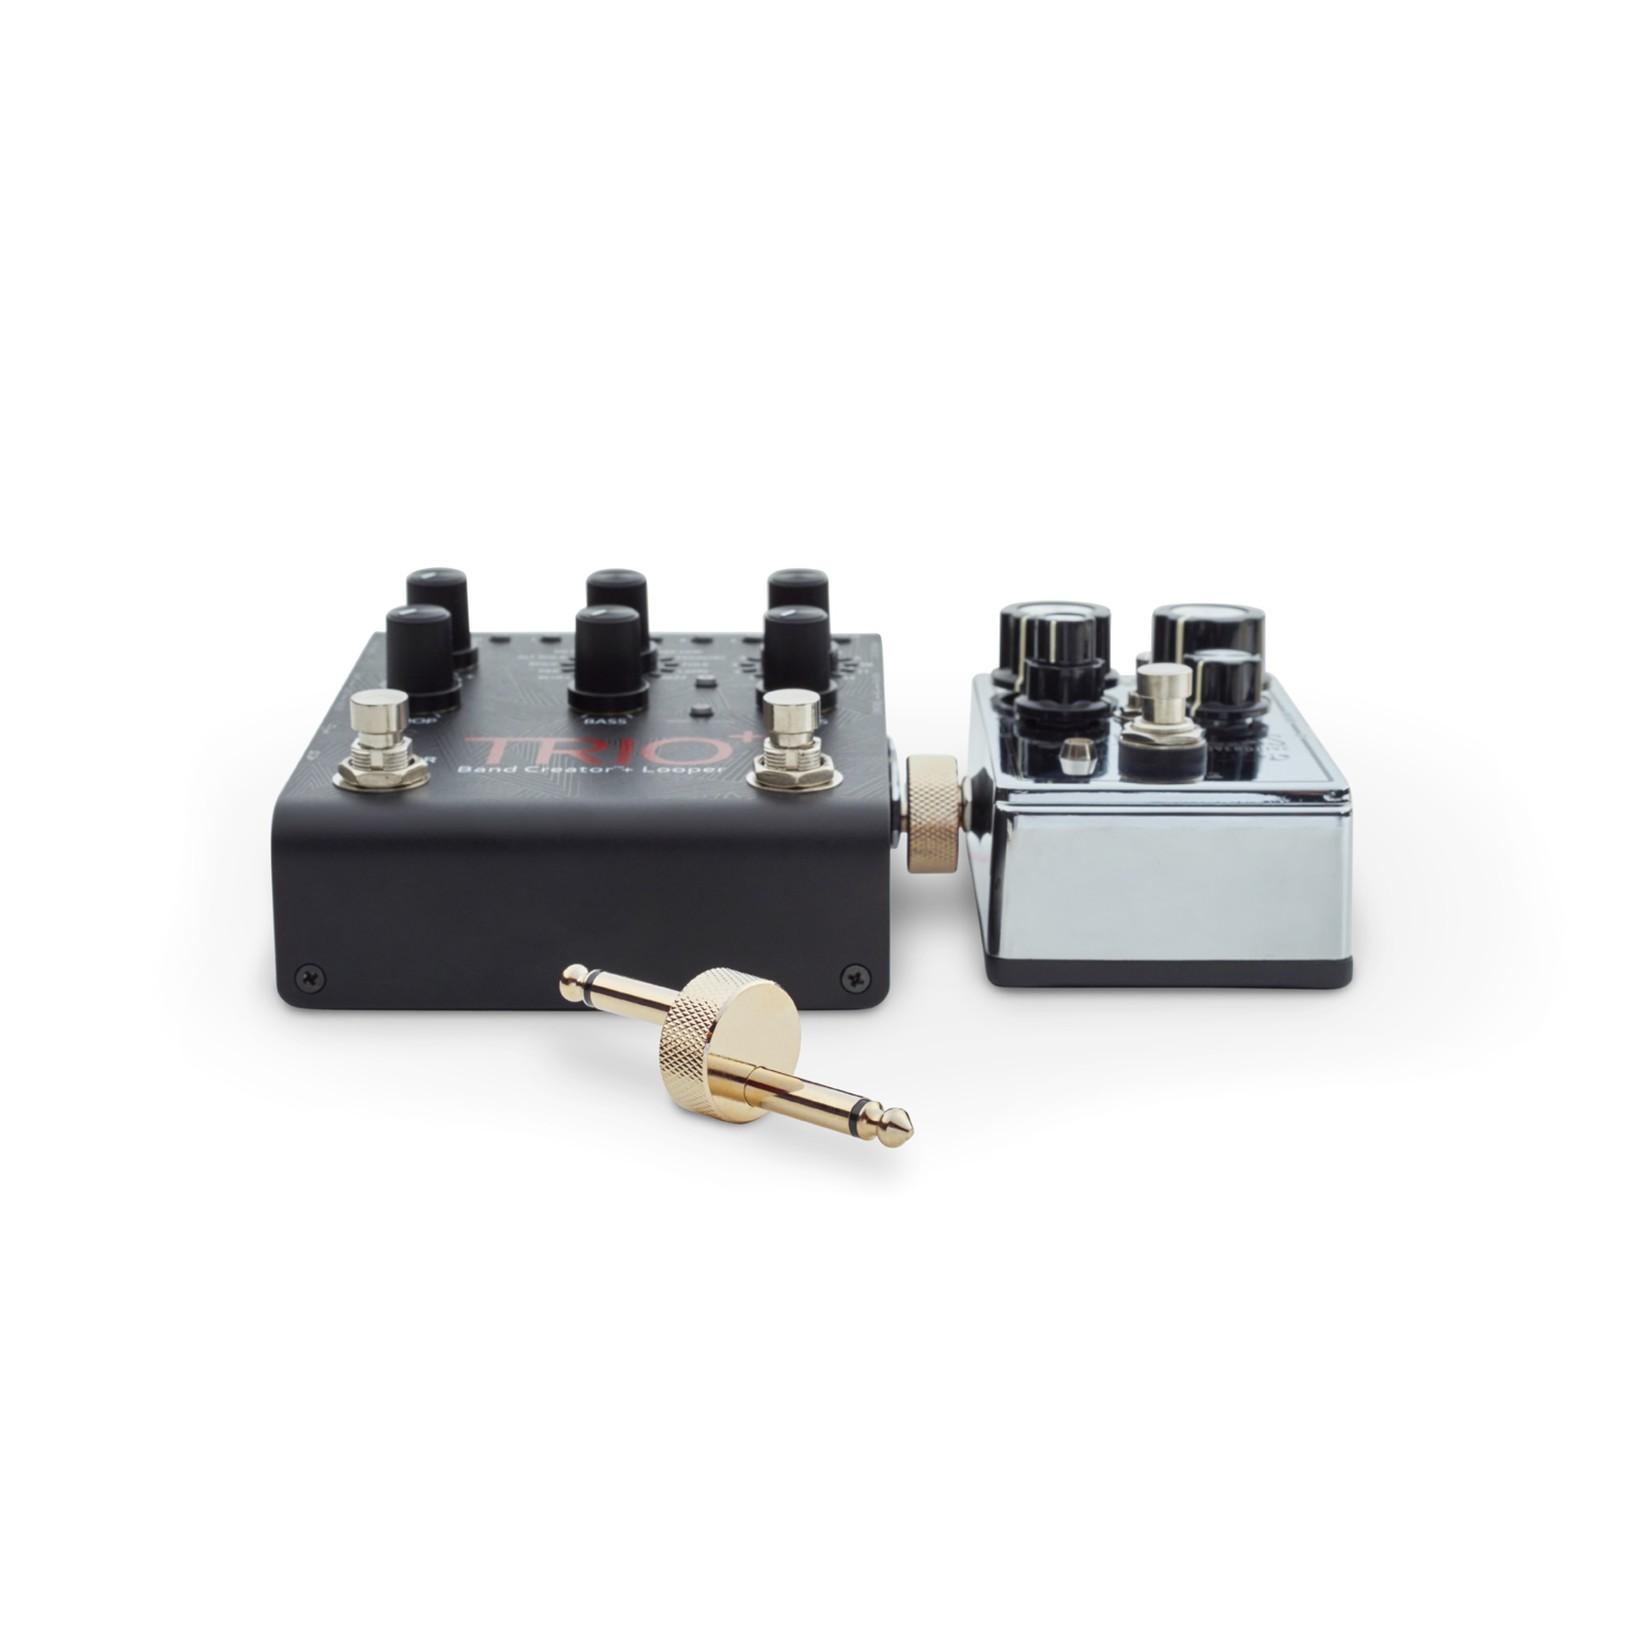 "Rockboard Rockboard Compact Pedal Z-Connector/Coupler, Gold - Plug to Plug Length: 10mm / 3/8"""